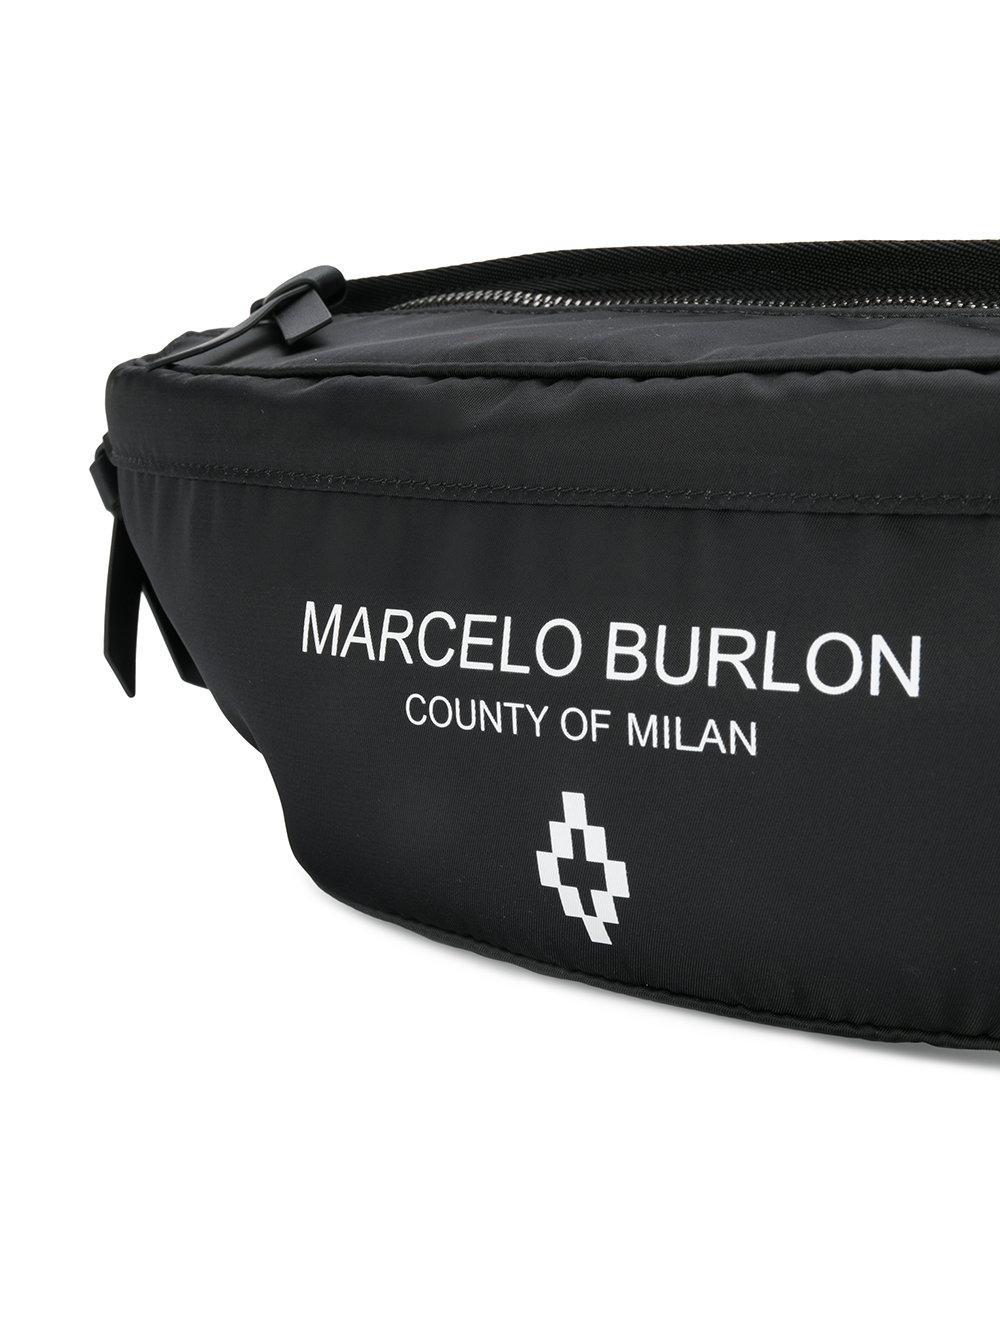 MARCELO BURLON COUNTY OF MILAN Sac banane à logo imprimé i03OmGoFXm